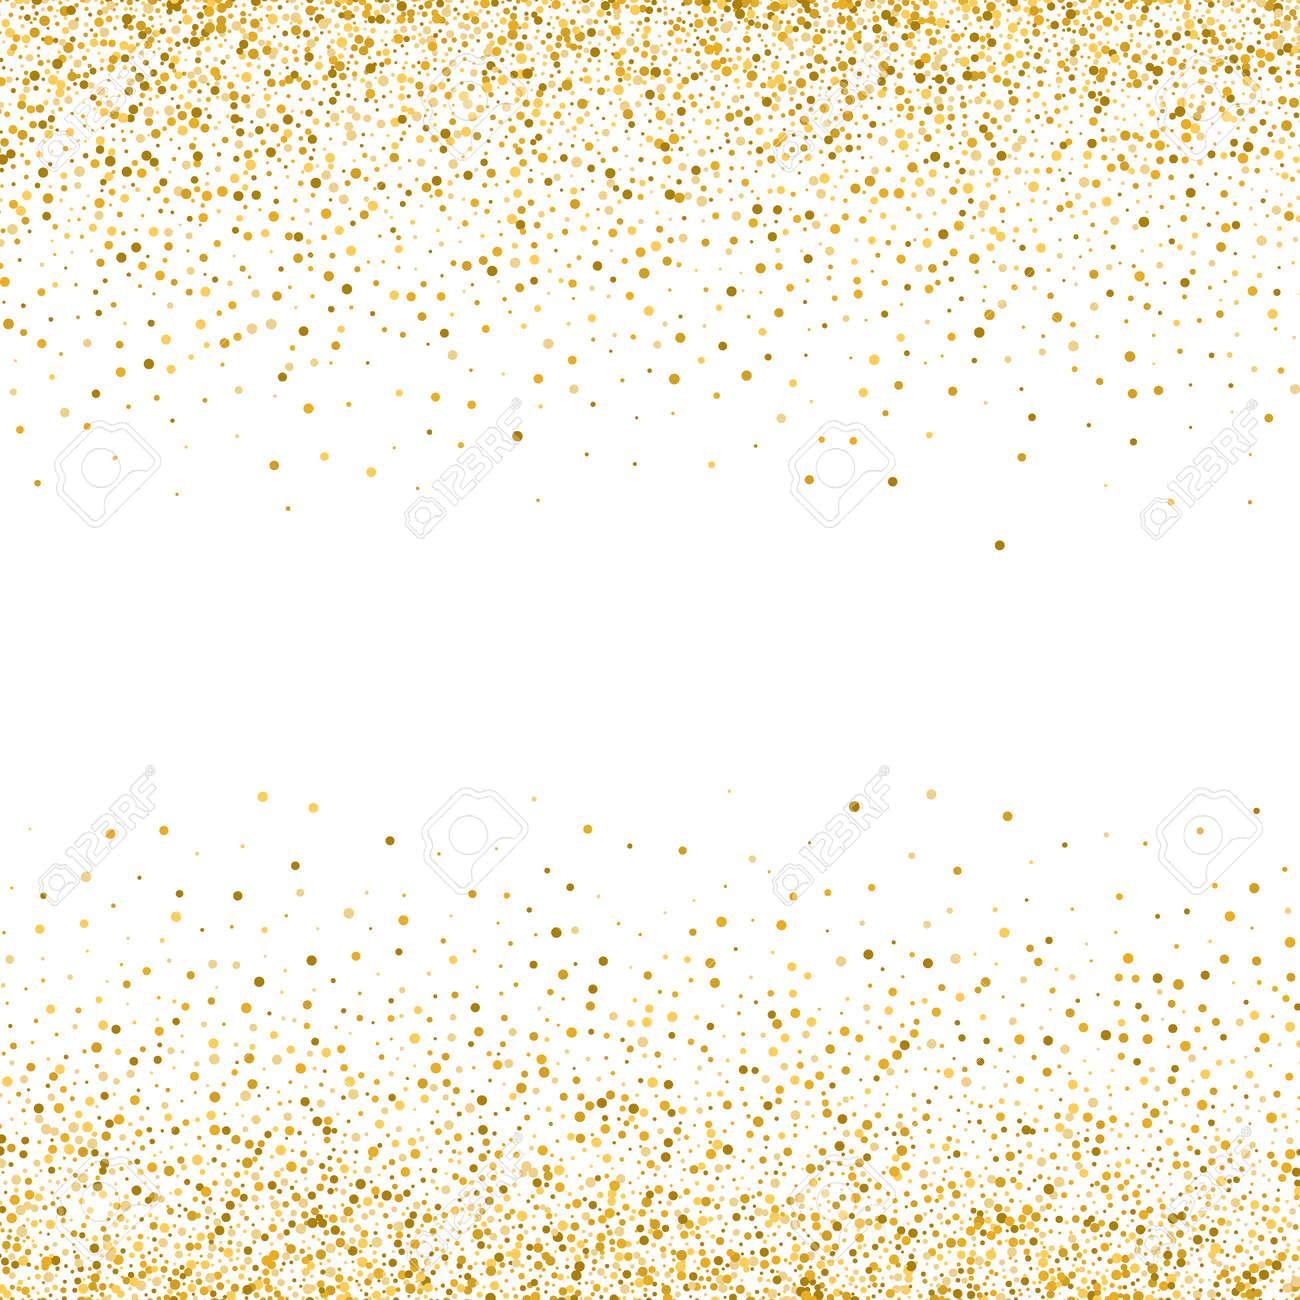 Gold glitter texture on white background Golden dots background - 169594020